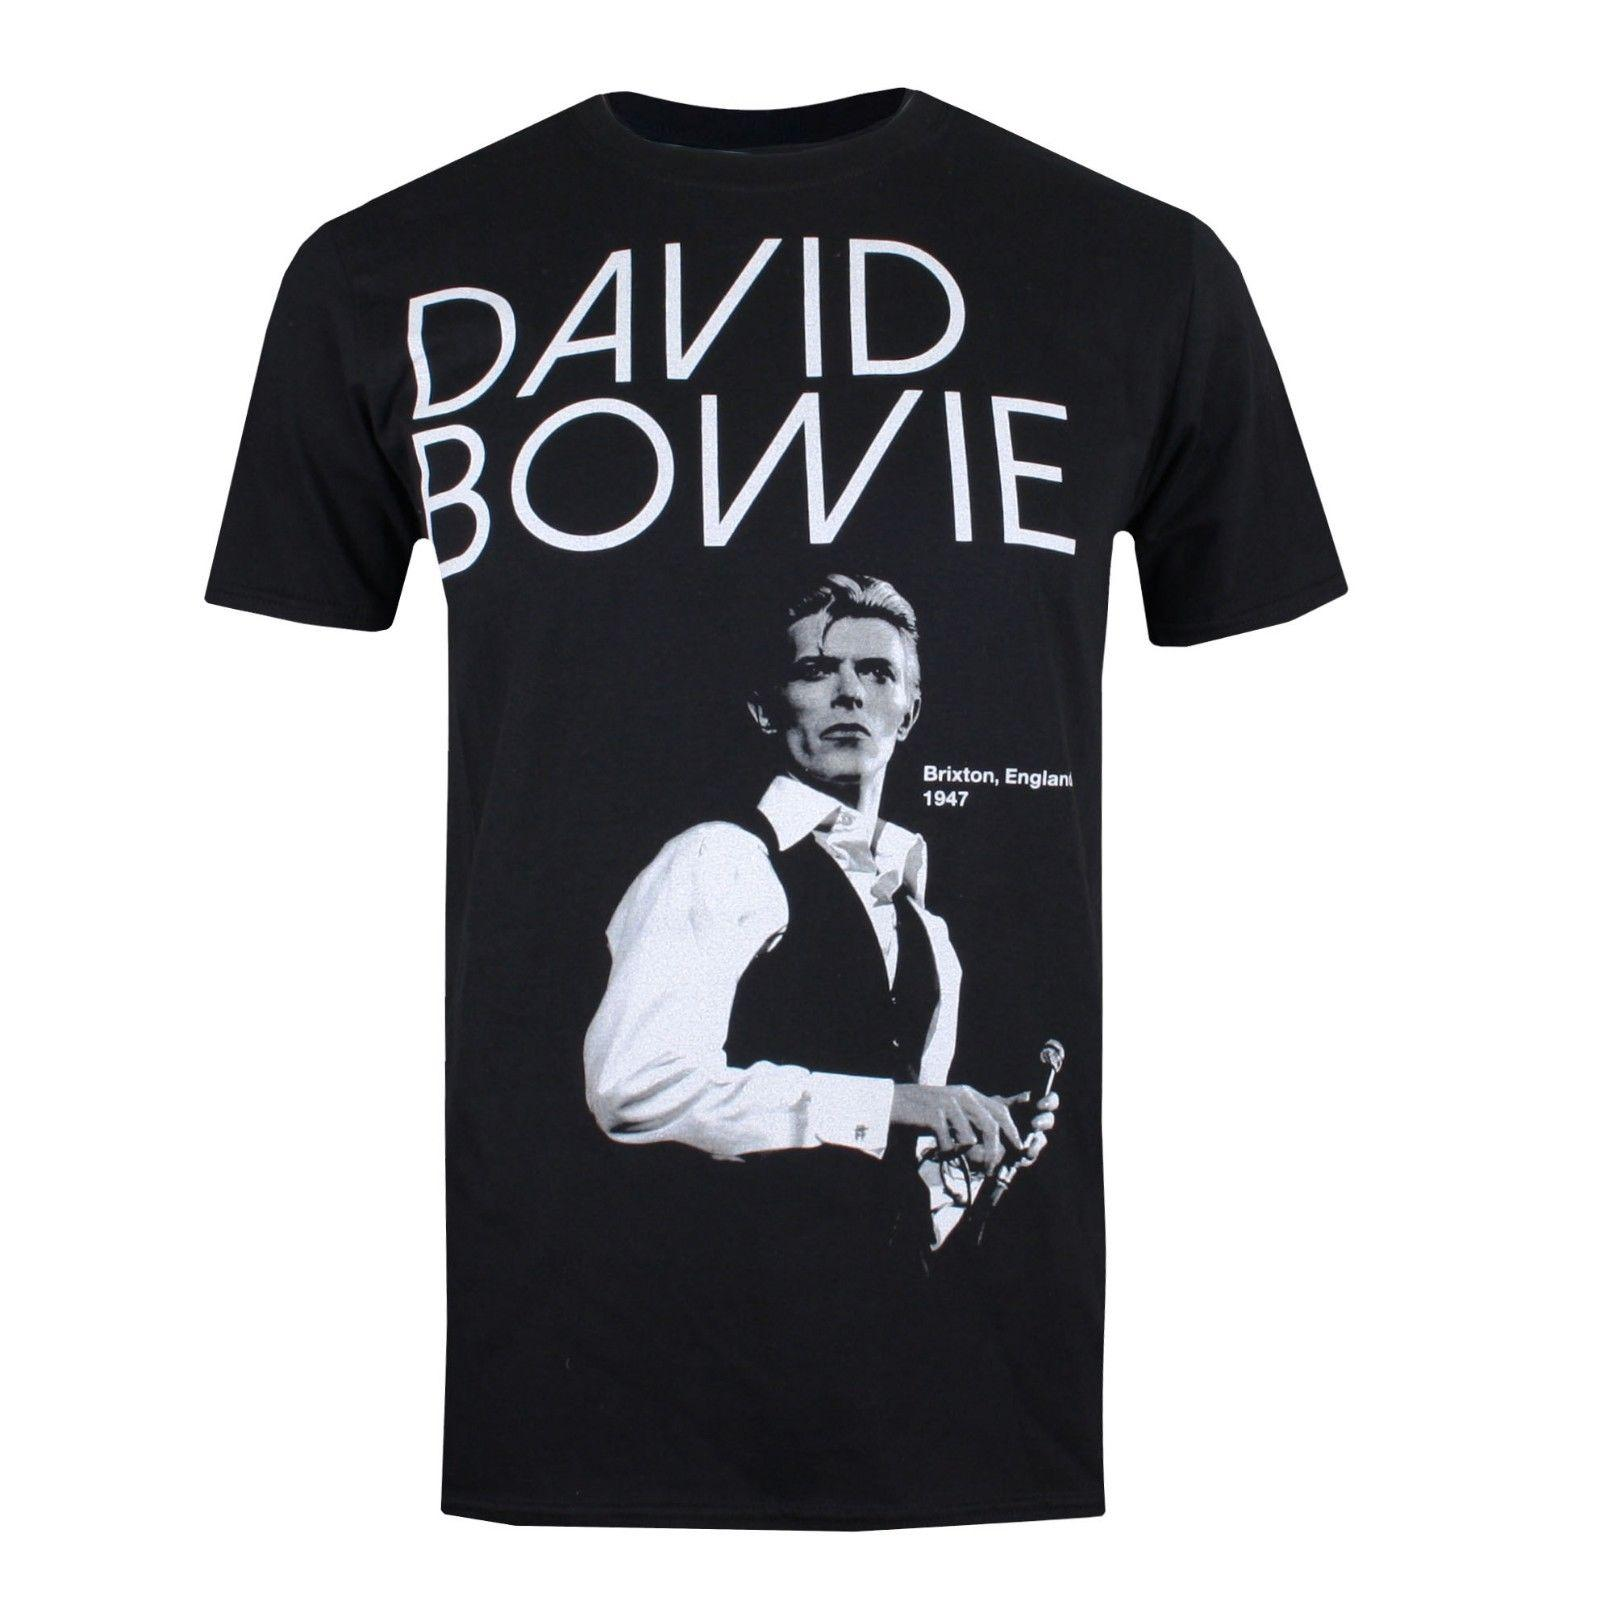 4ad1040217 David Bowie Brixton 1947 Official Men'S T Shirt Black 2018 New Tee Print  Men T Shirt Tops Hip Hop Short T Shirt T Shirt Slogans Dirty T Shirts From  ...